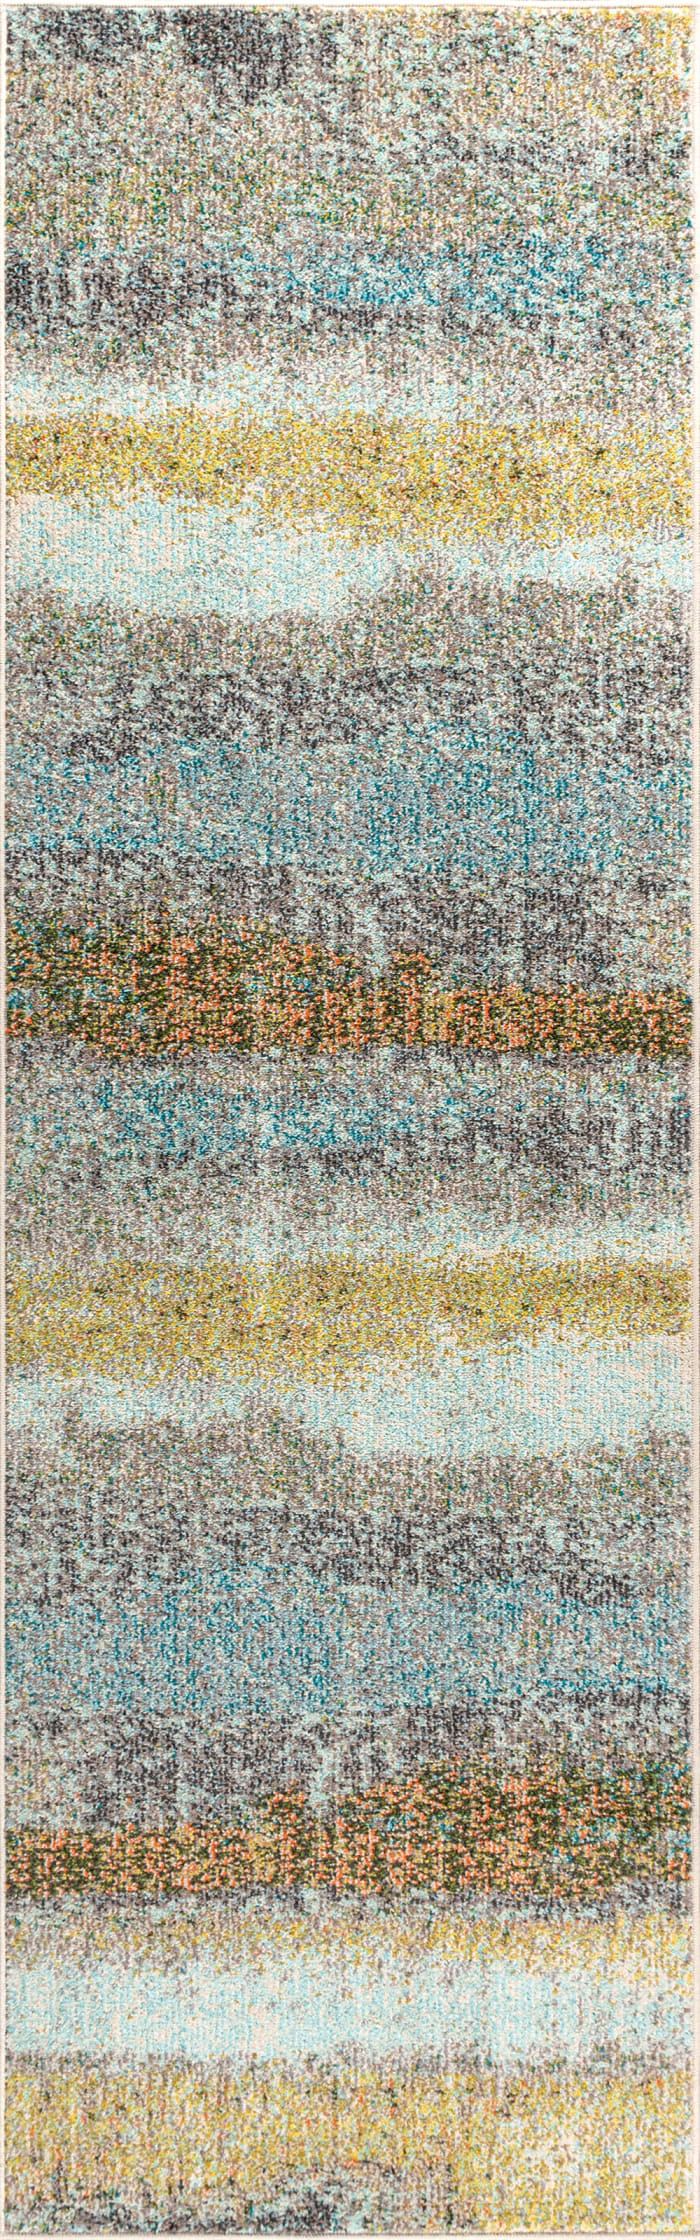 Contemporary POP Modern Abstract Vintage Cream/Yellow Runner Rug